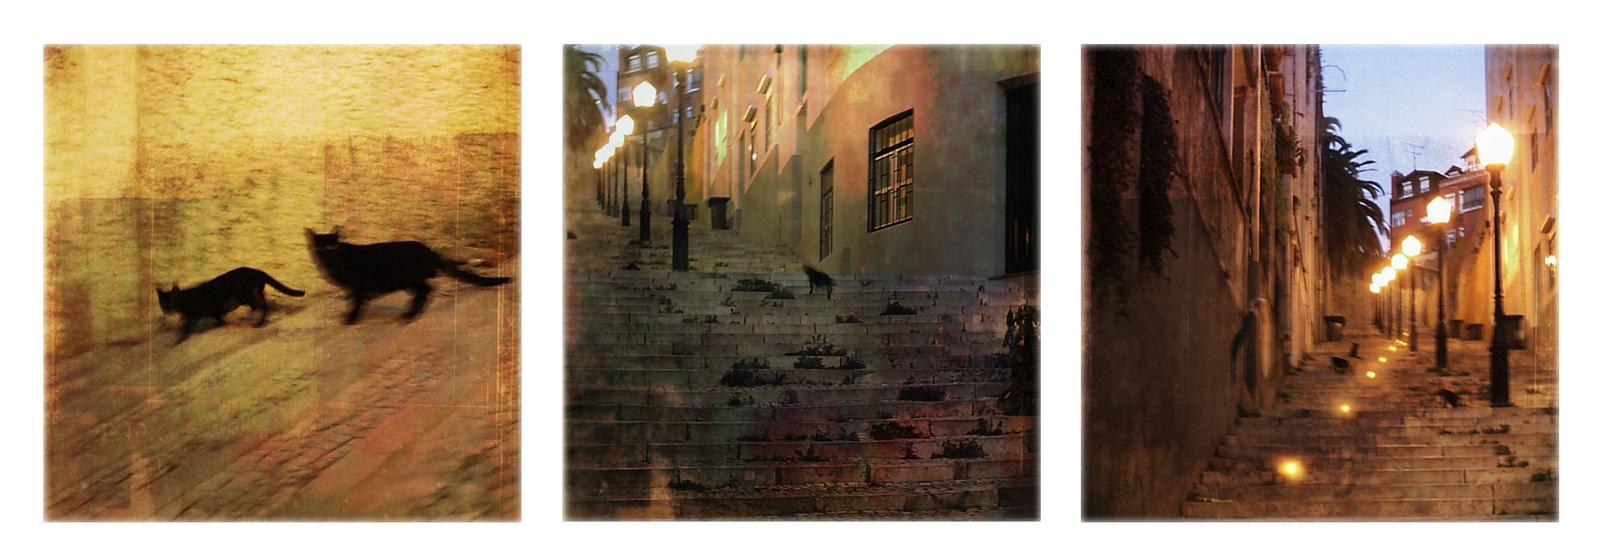 ombres furtives by rioMenor